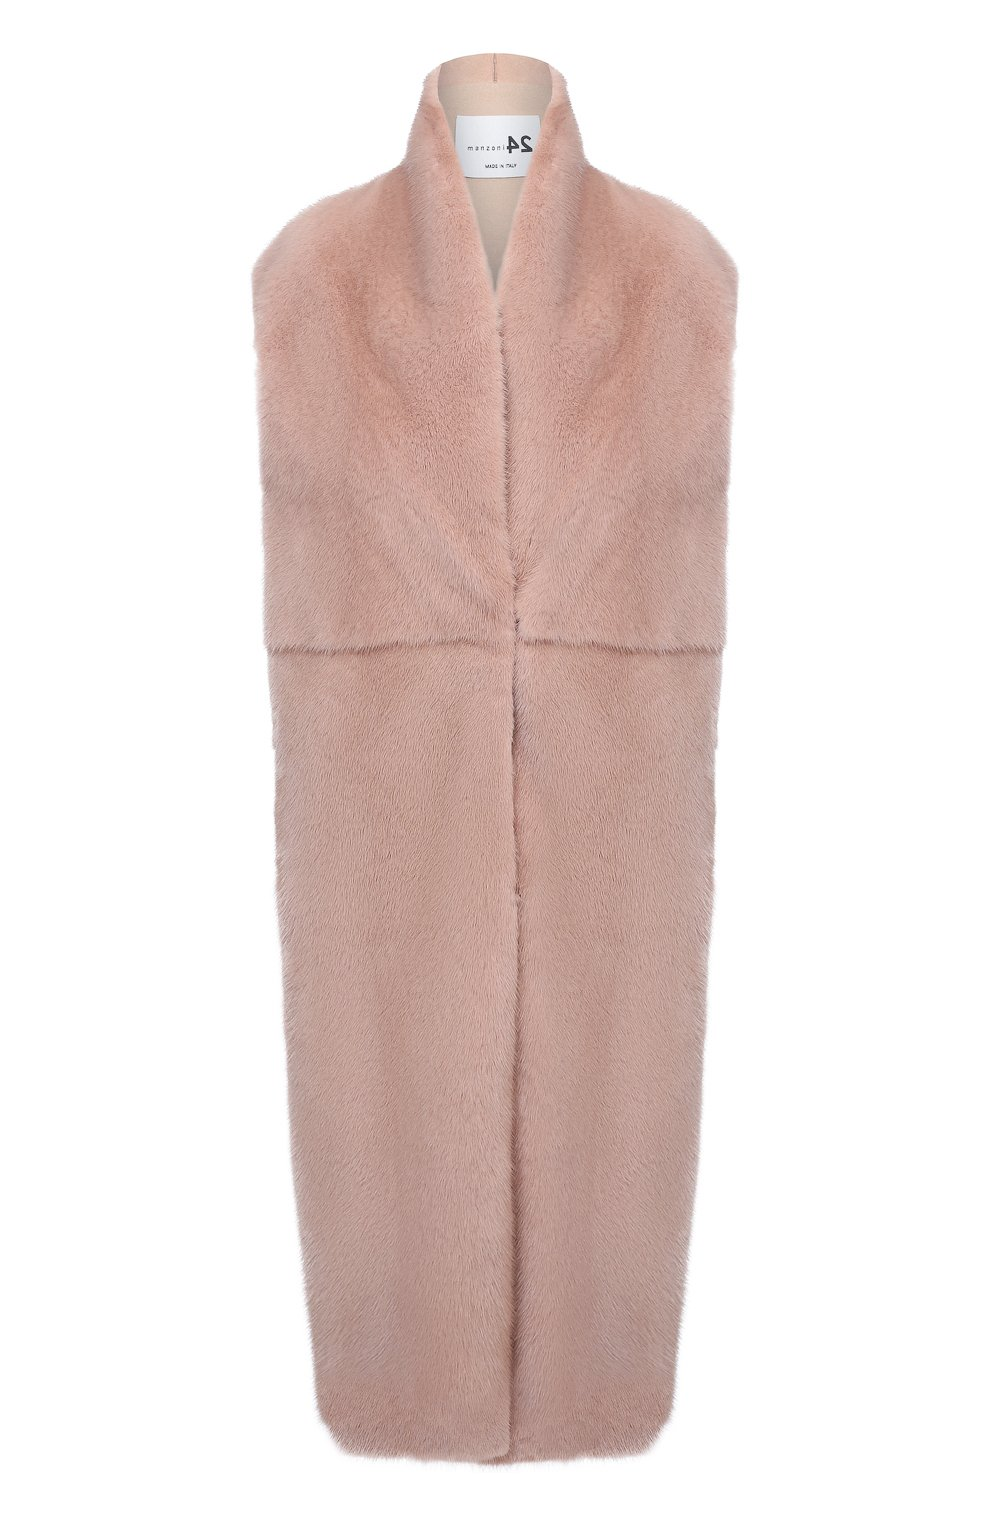 Женский жилет из меха норки MANZONI24 светло-розового цвета, арт. 20M536-VDB1/38-46   Фото 1